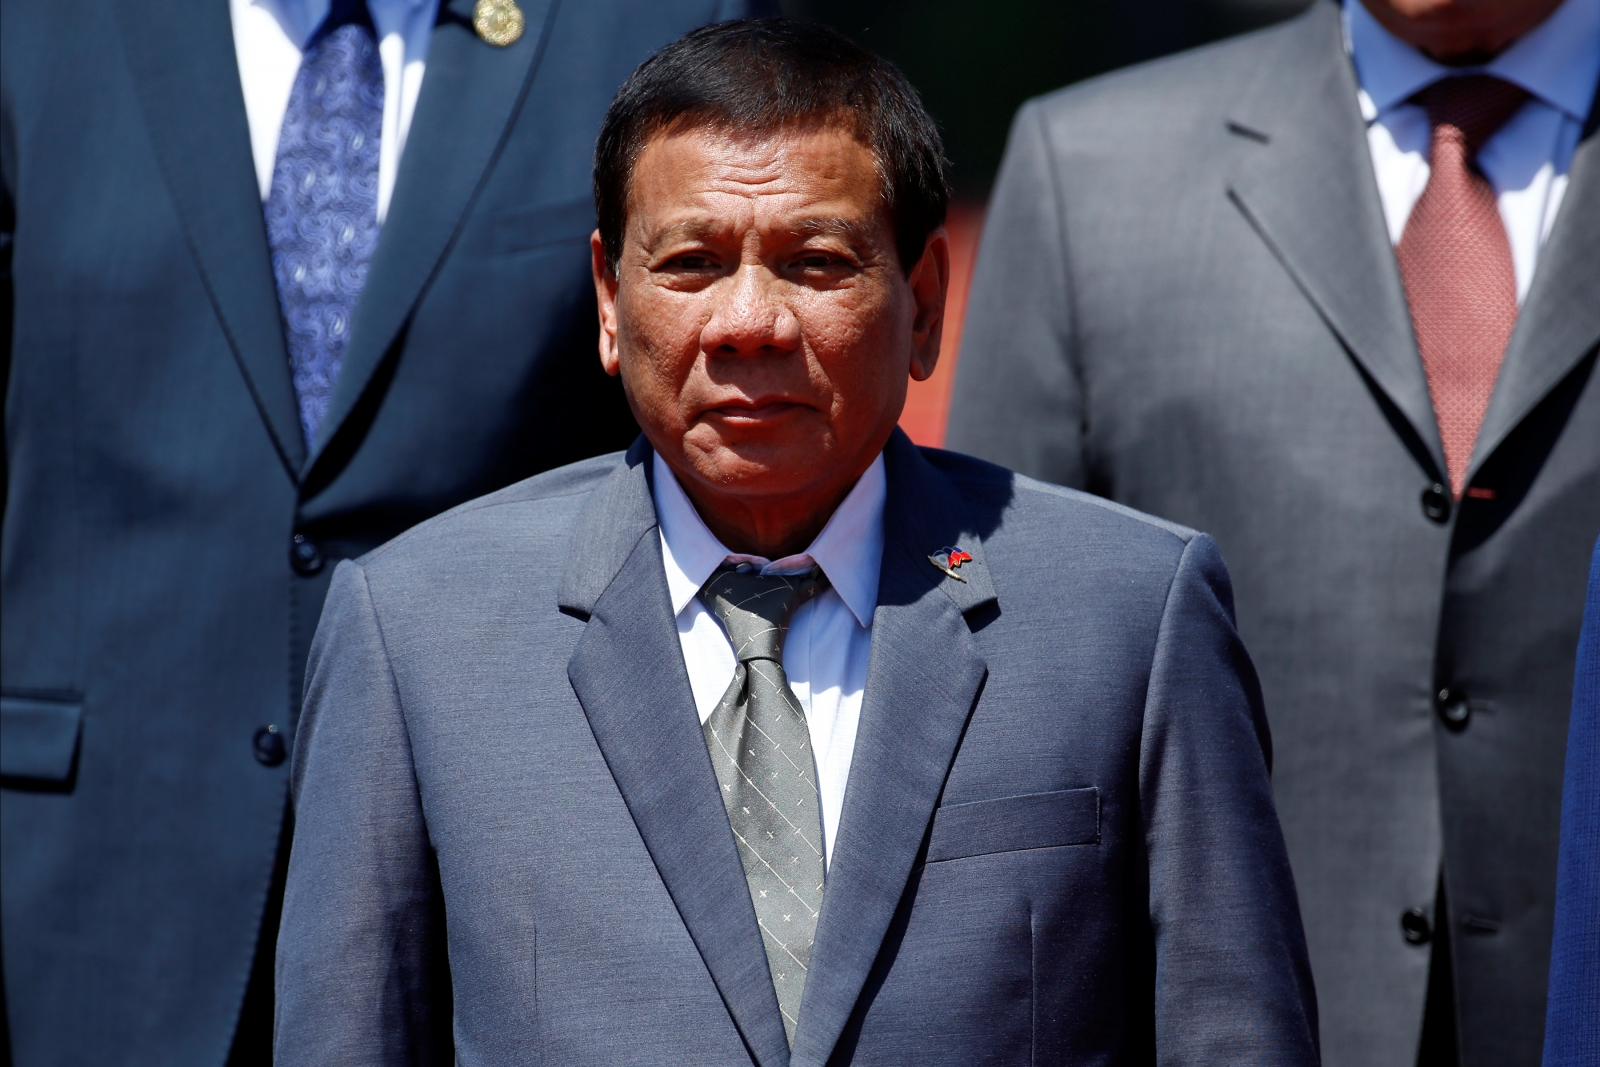 Philippines: Duterte declares martial law in Mindanao amid clashes